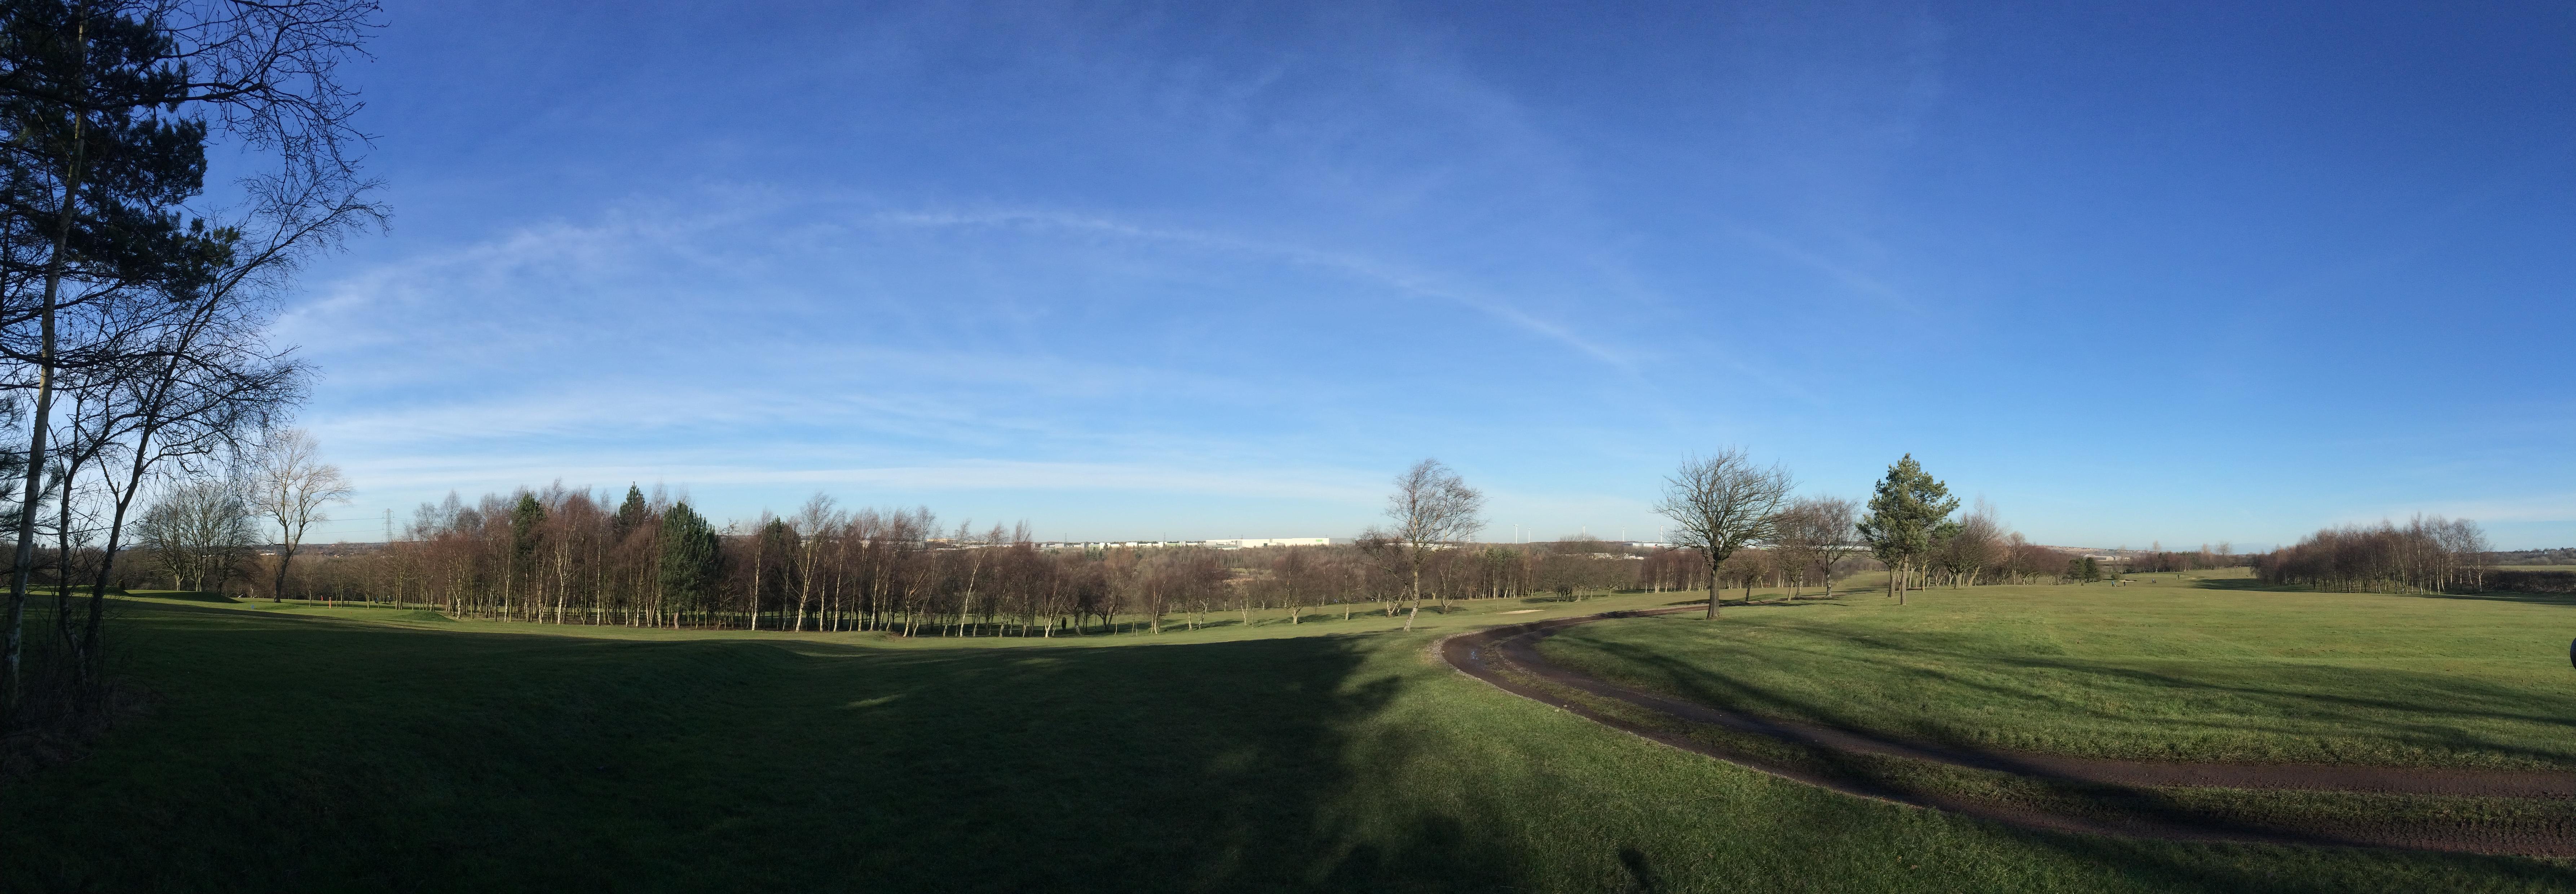 Wearside Golf Club